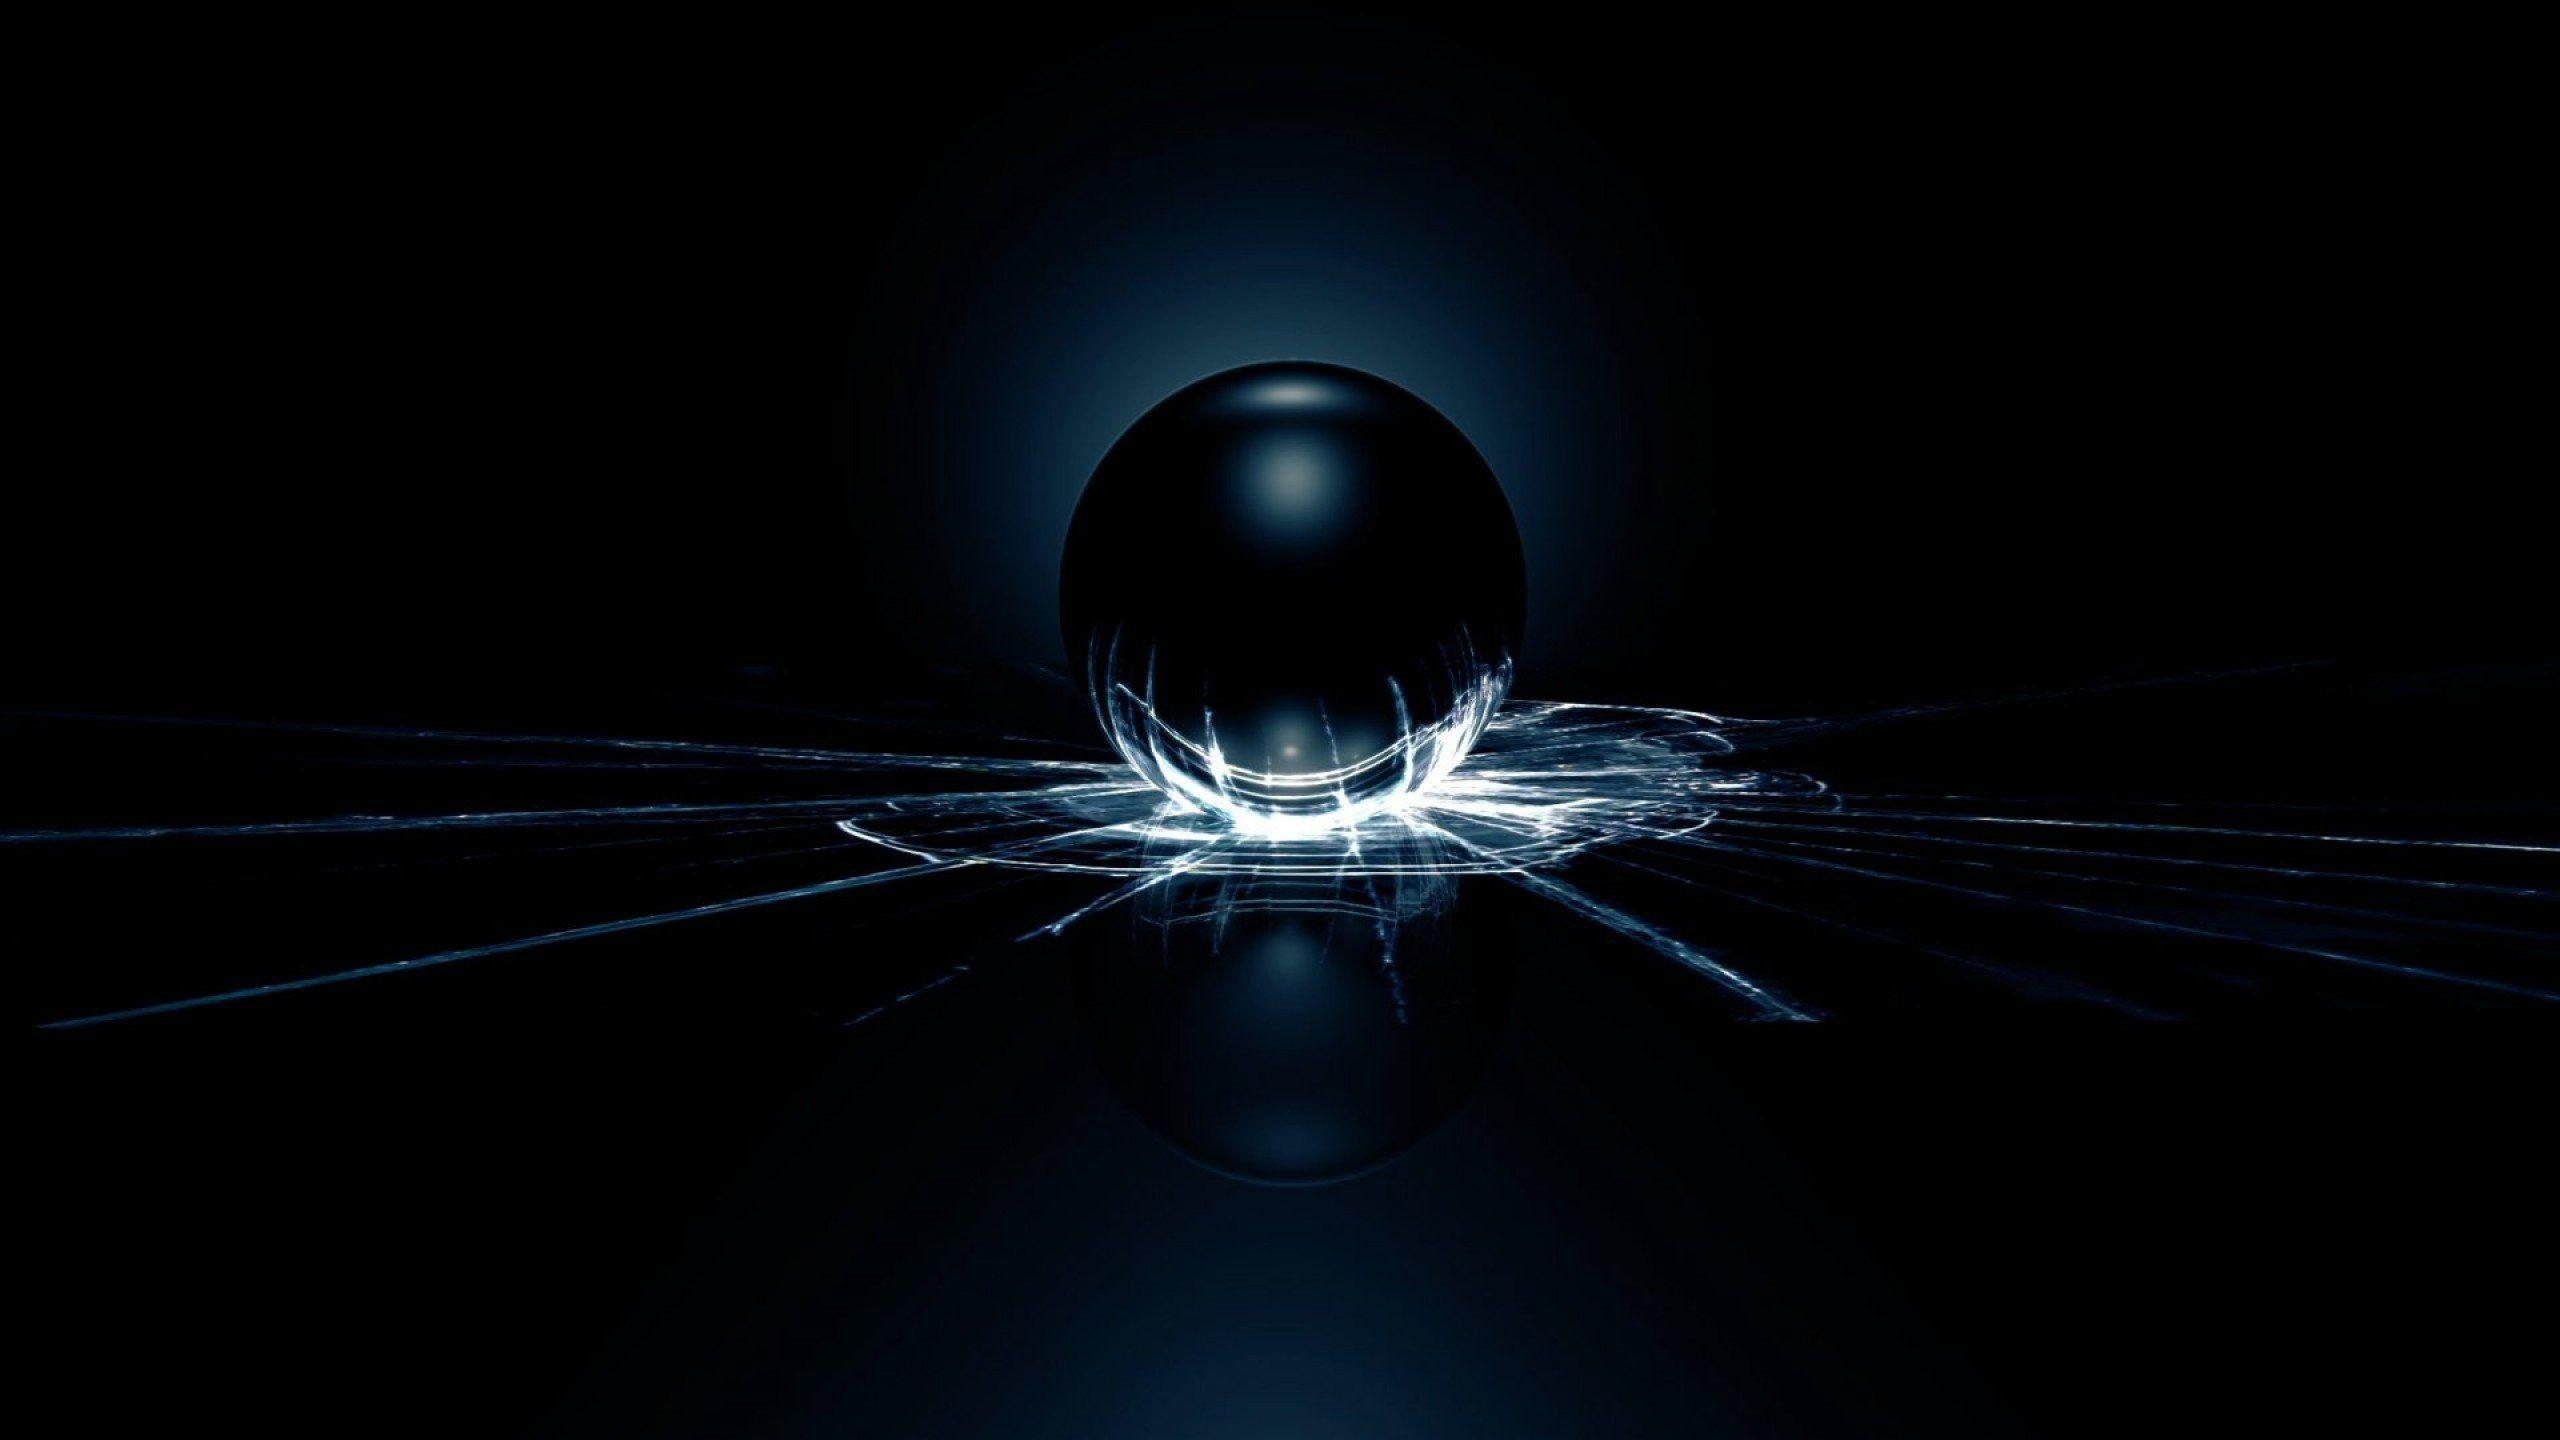 Res: 2560x1440, glass-background-ball-wallpapers-wallpaper-desktop-crack-black-